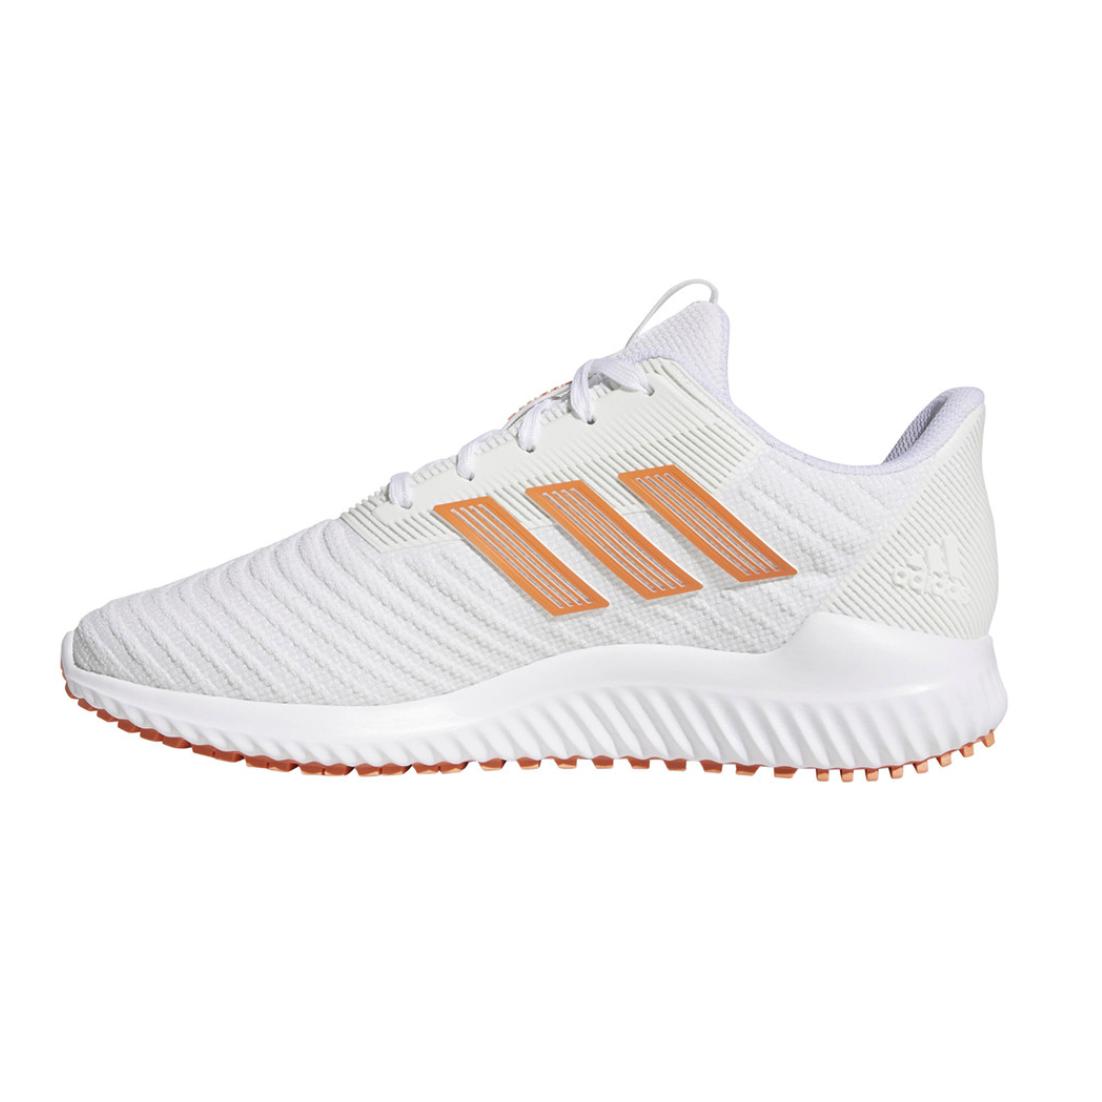 adidas 阿迪达斯 Climawarm 2 女士跑鞋 F36725 白橙 38.5